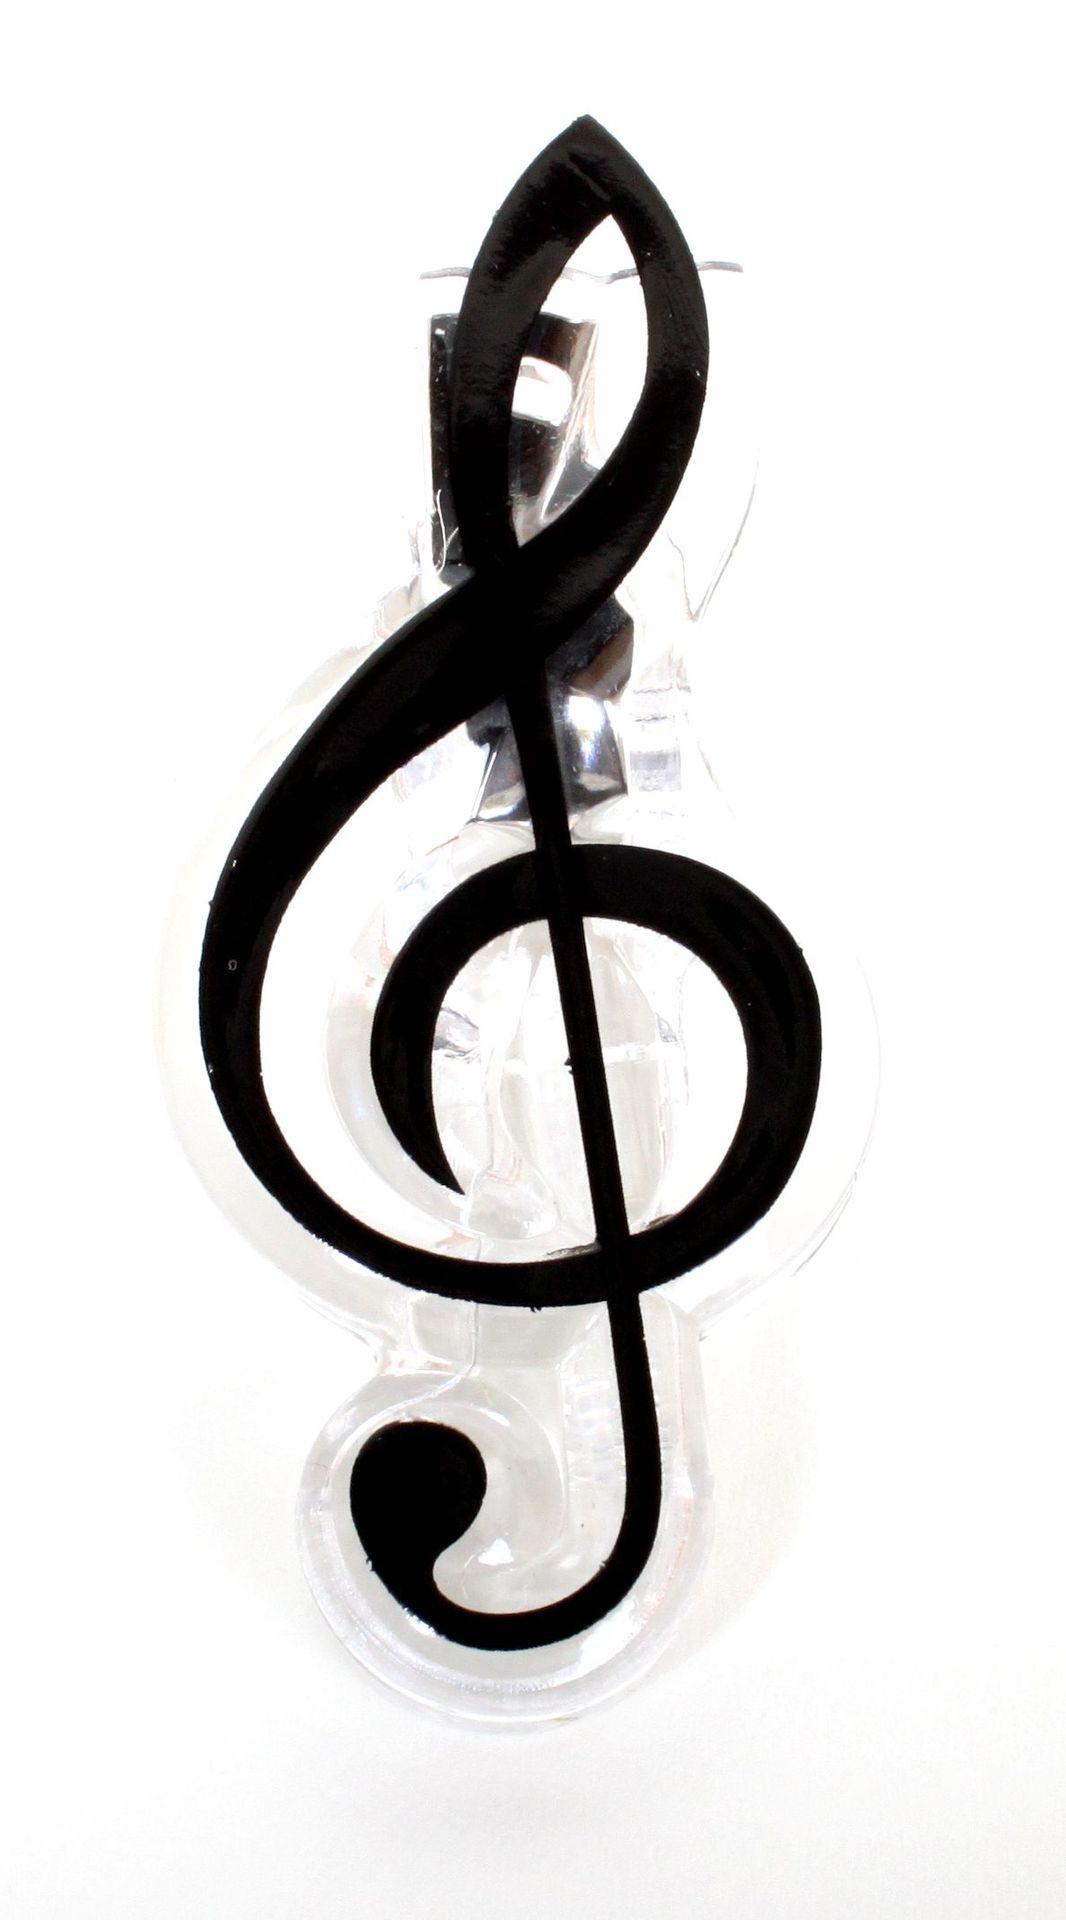 Notenklammer Violinschlüssel  ca. 7 cm groß Noten Clip